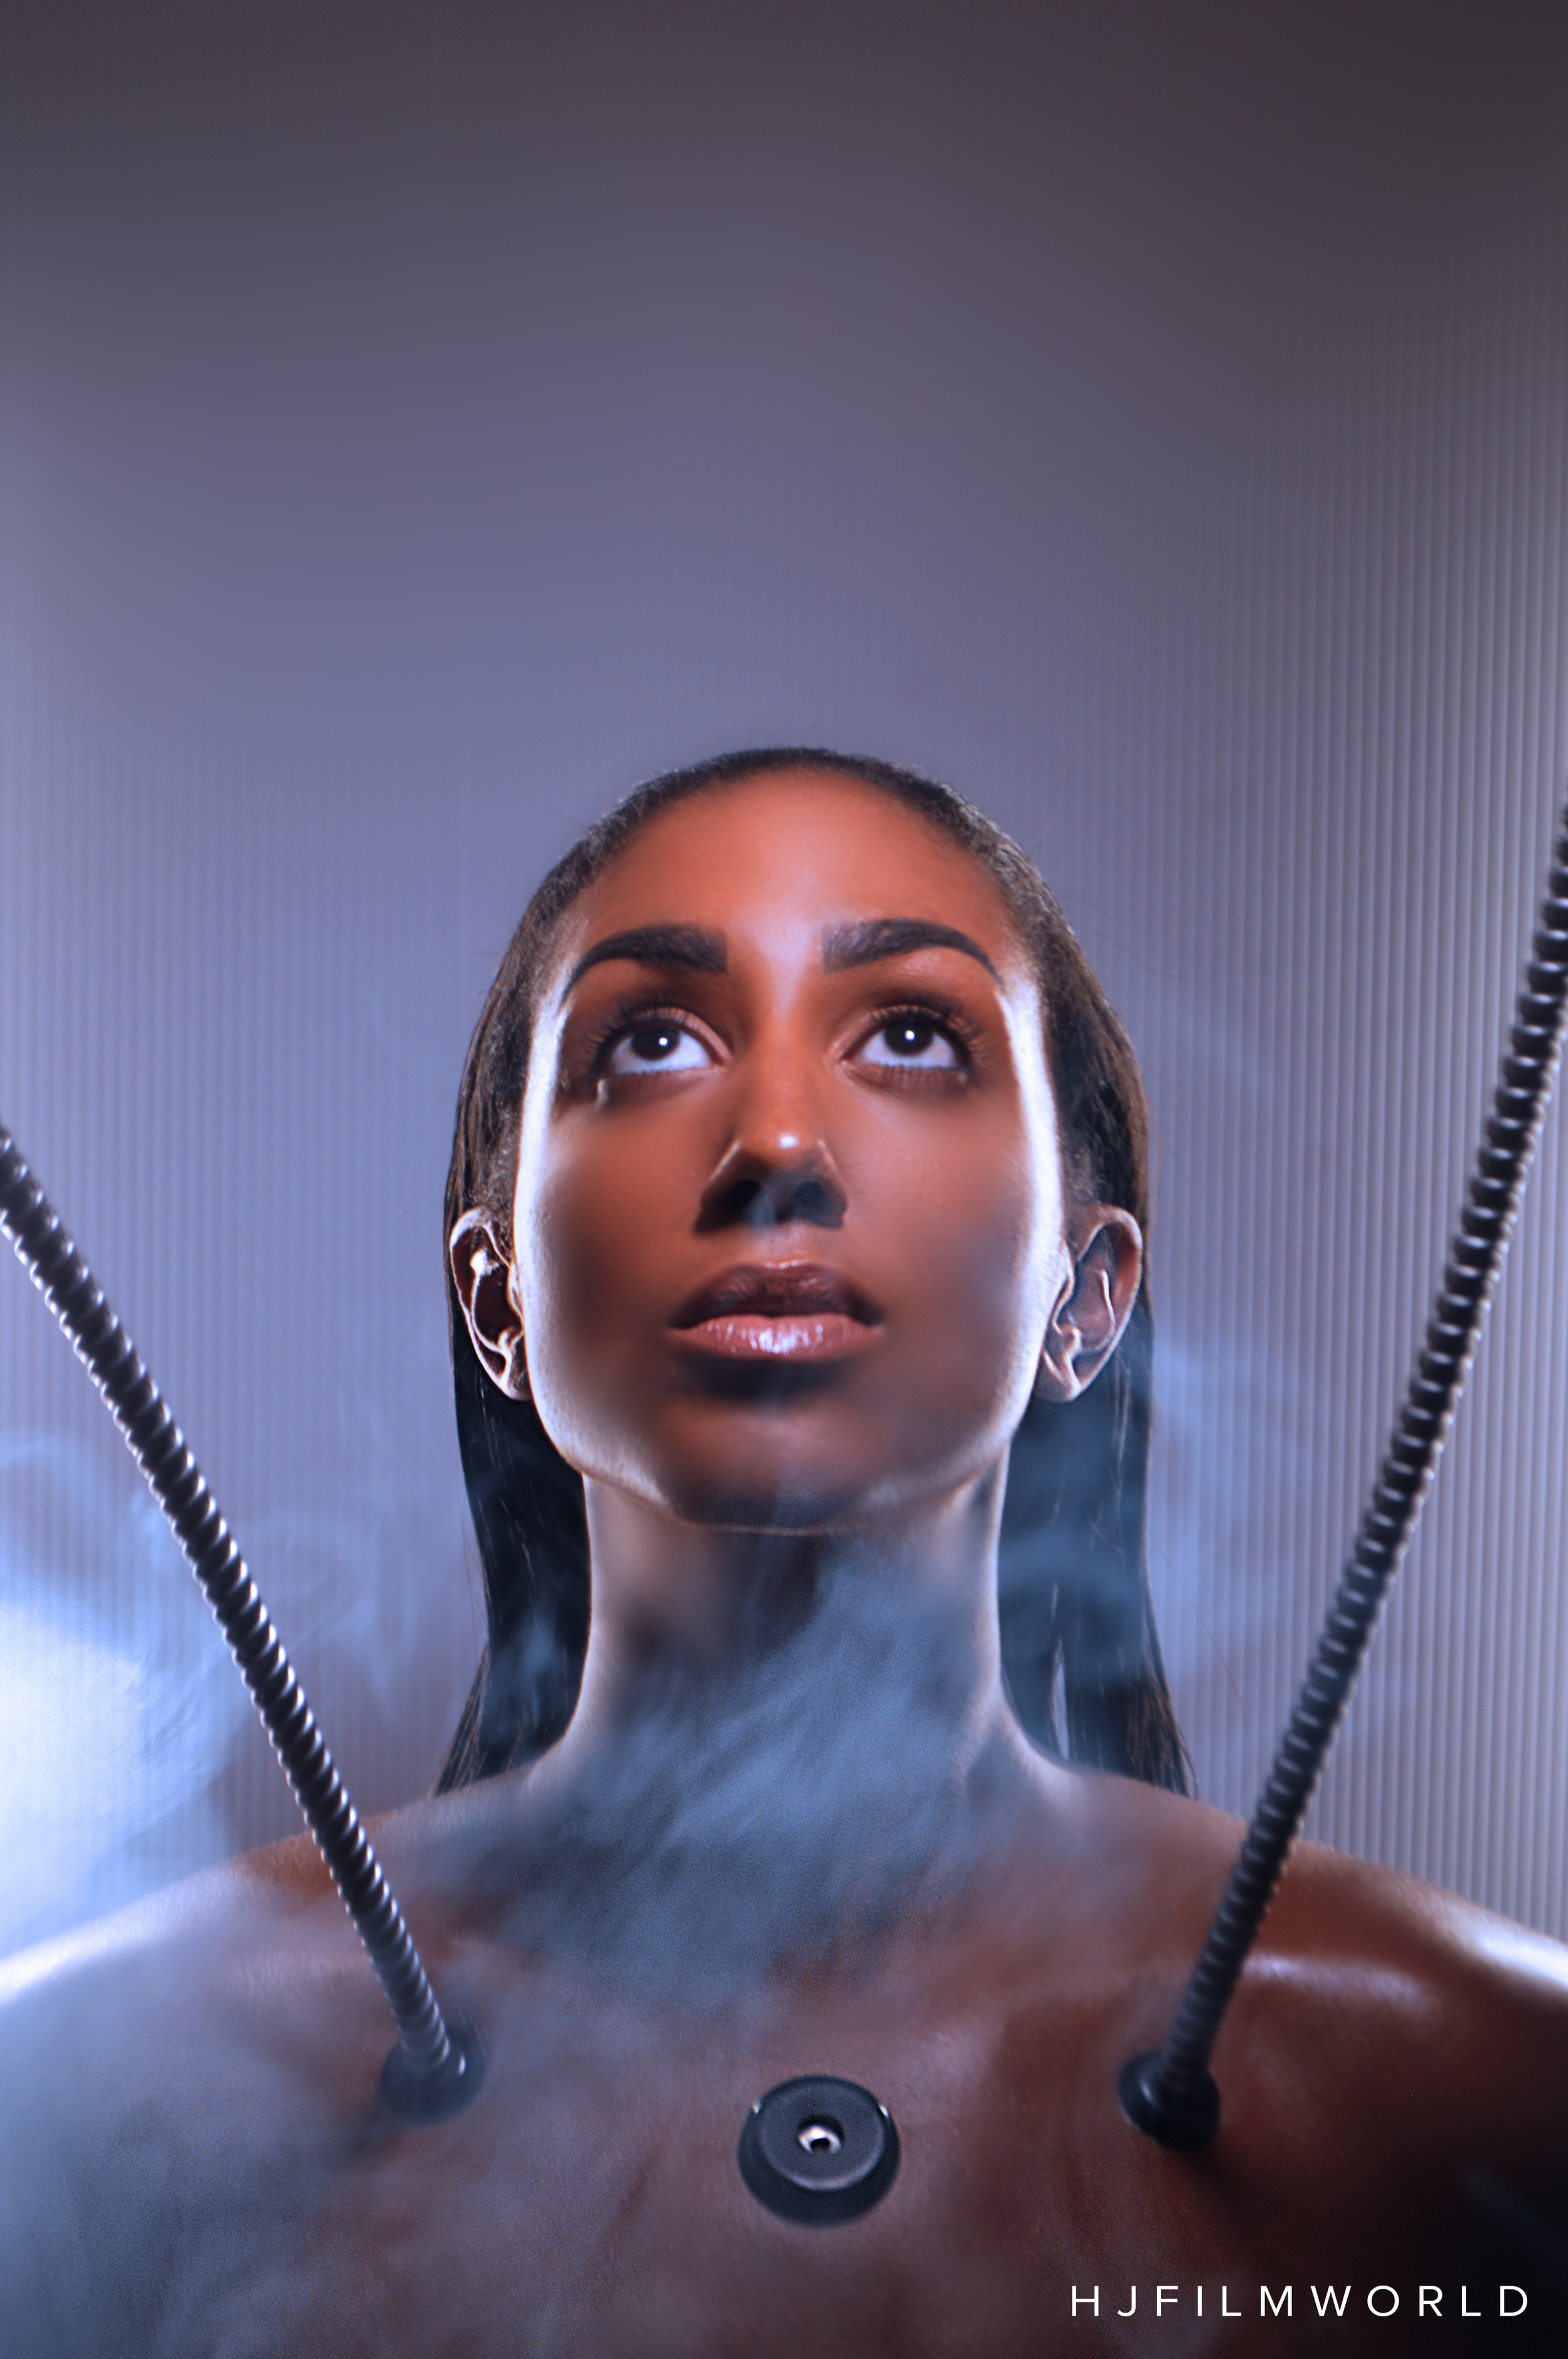 Model: Liyah Bentley